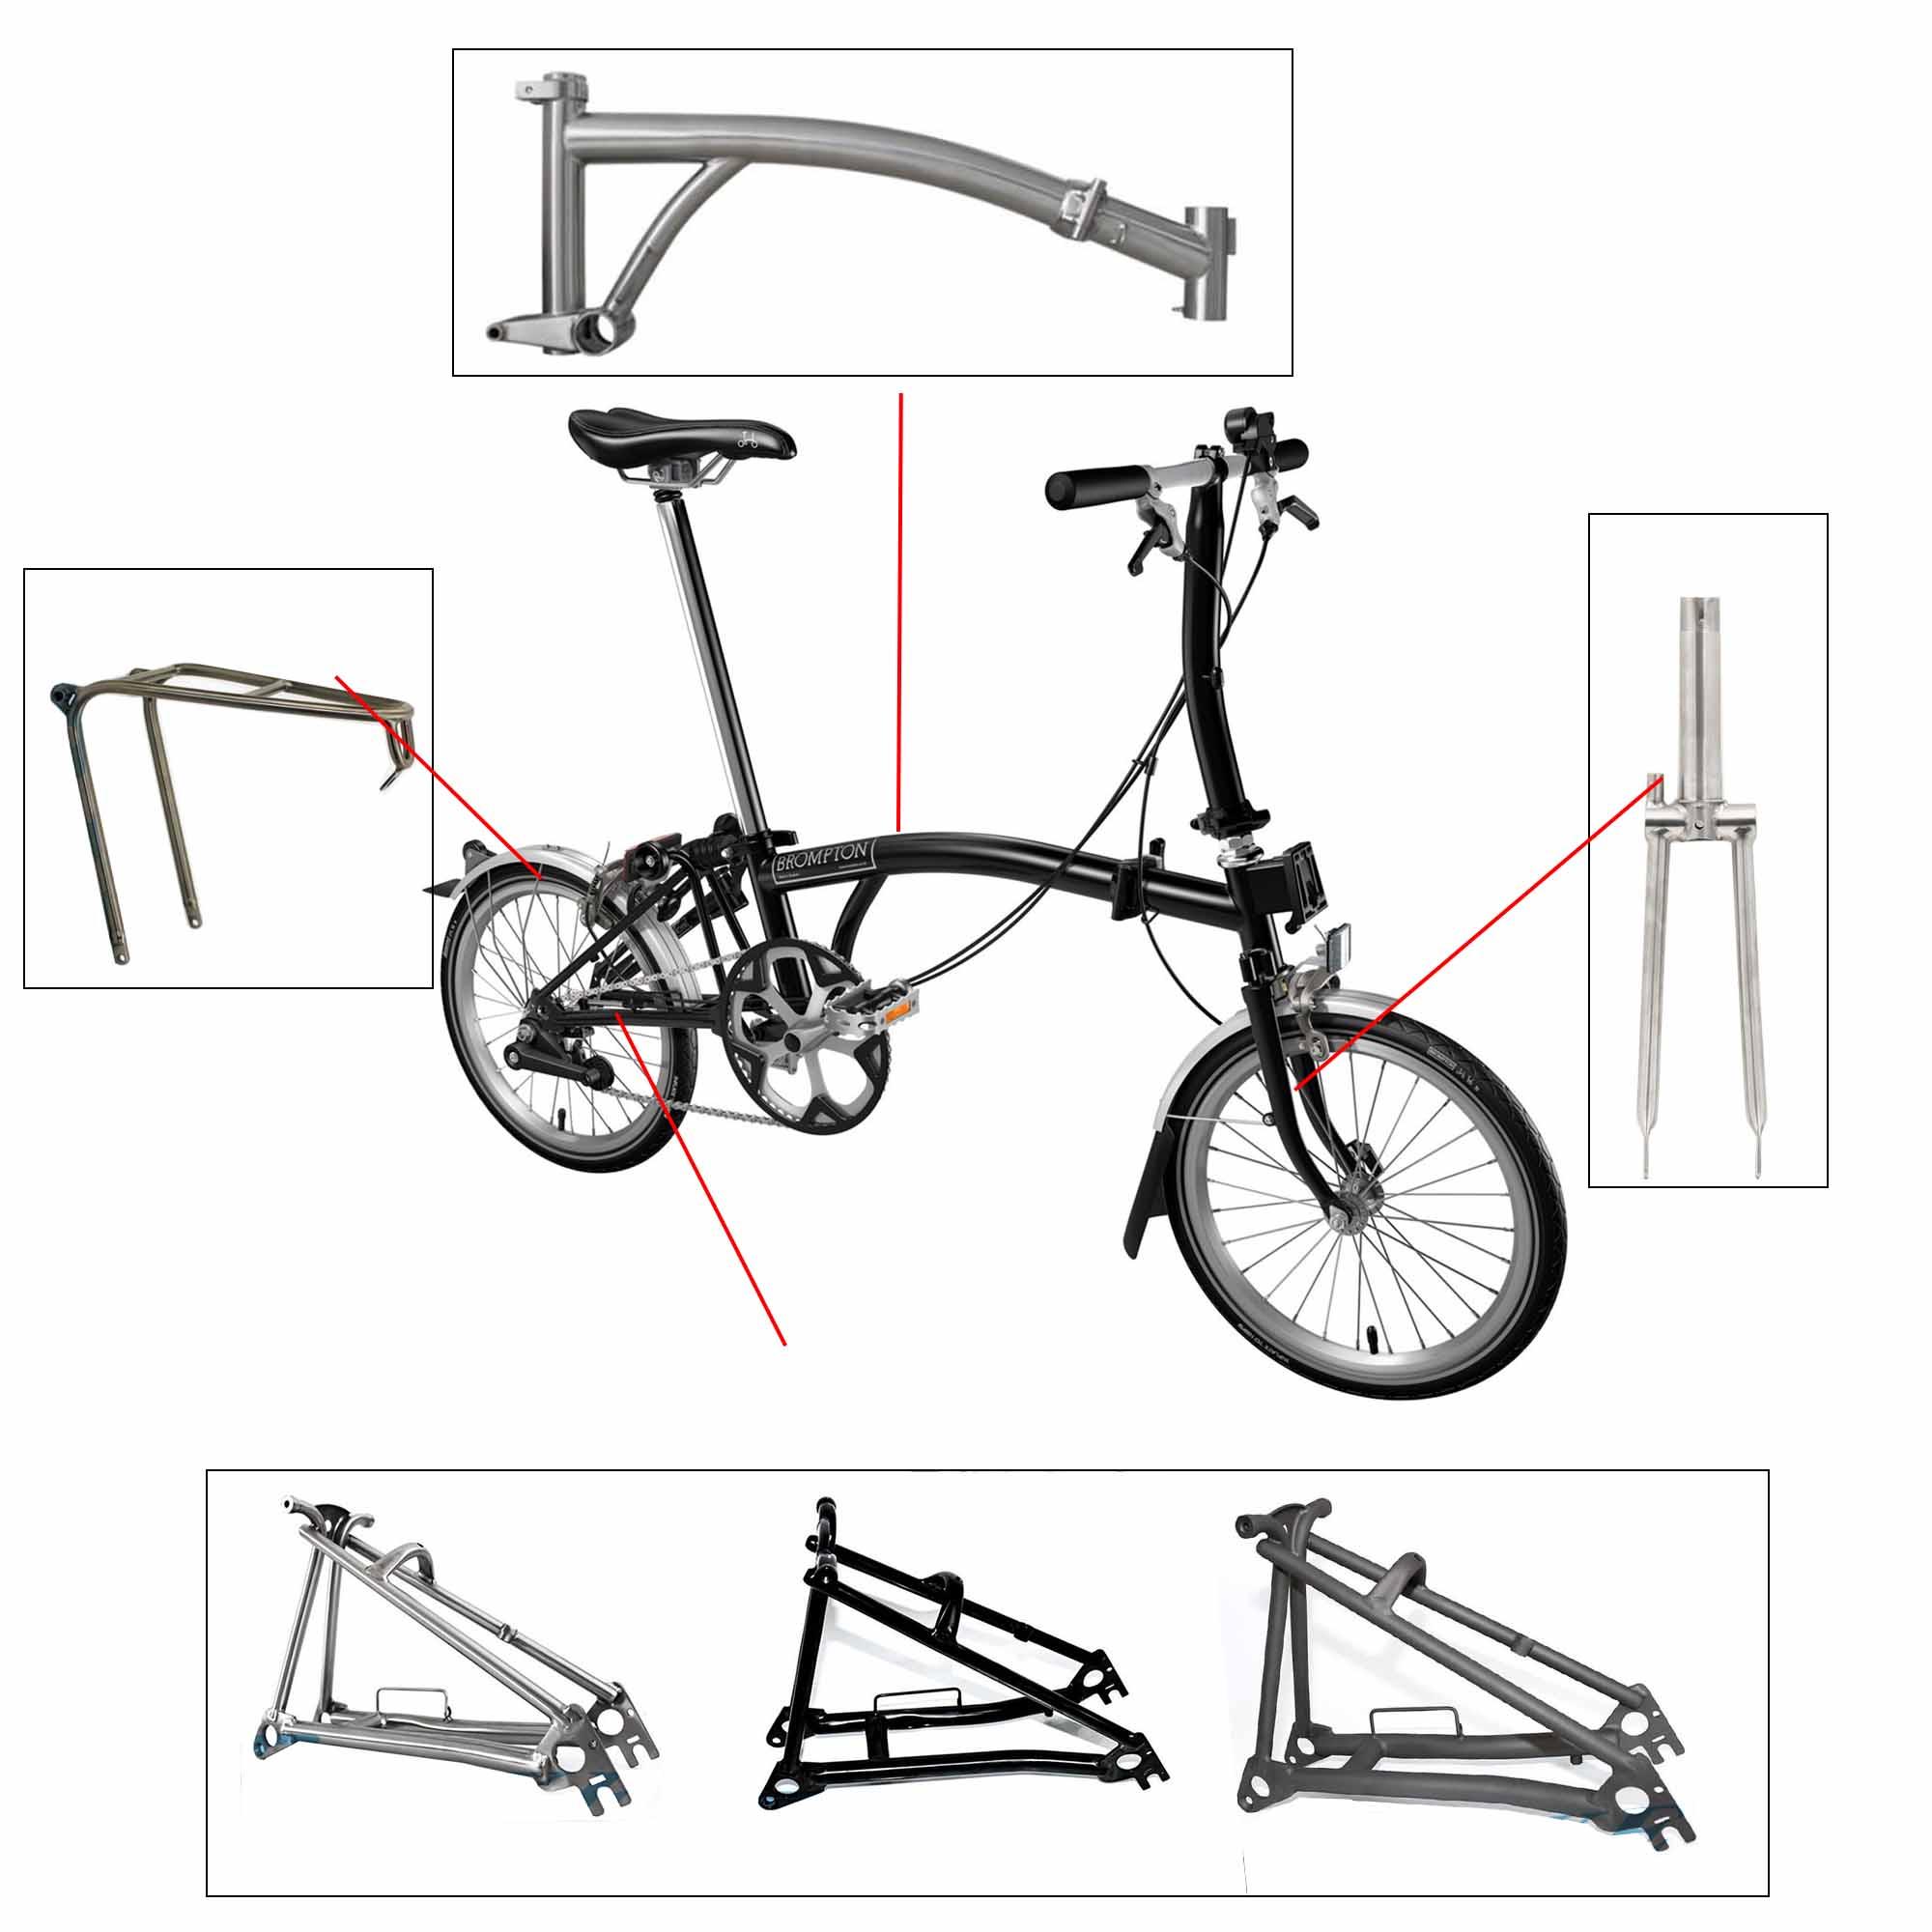 Aceoffix Bike Frame For Brompton Bicycle Front Fork Titanium Alloy Rear Racks Frame